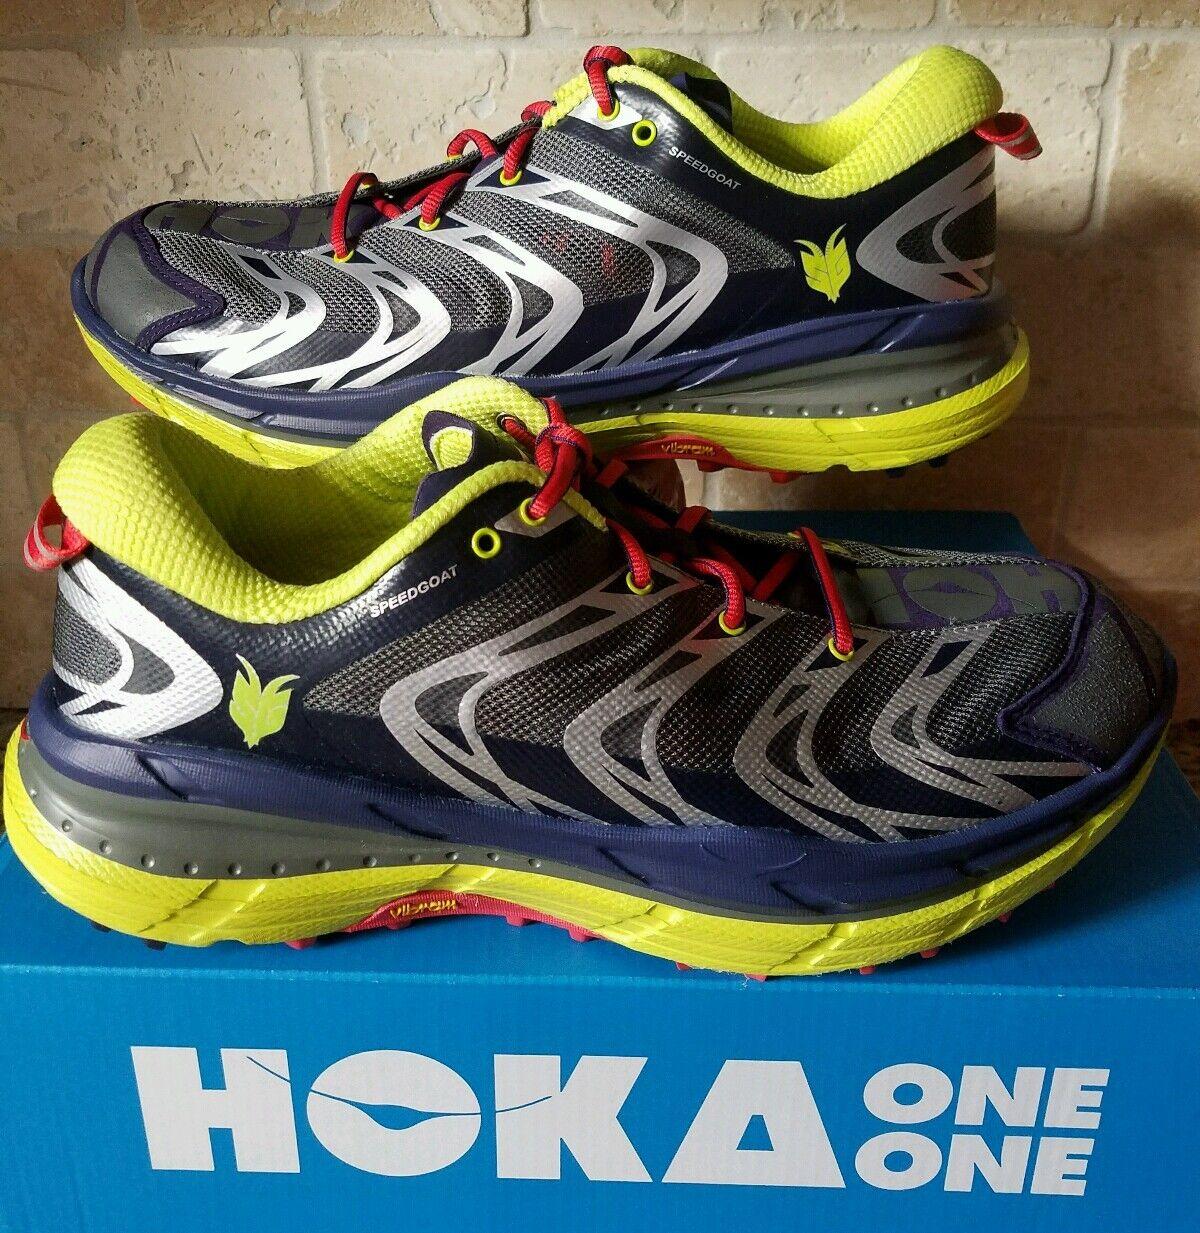 Hoka One One Speedgoat Astral Aura ácido Deporte Trail Senderismo Zapatos Talla 11.5 para hombres